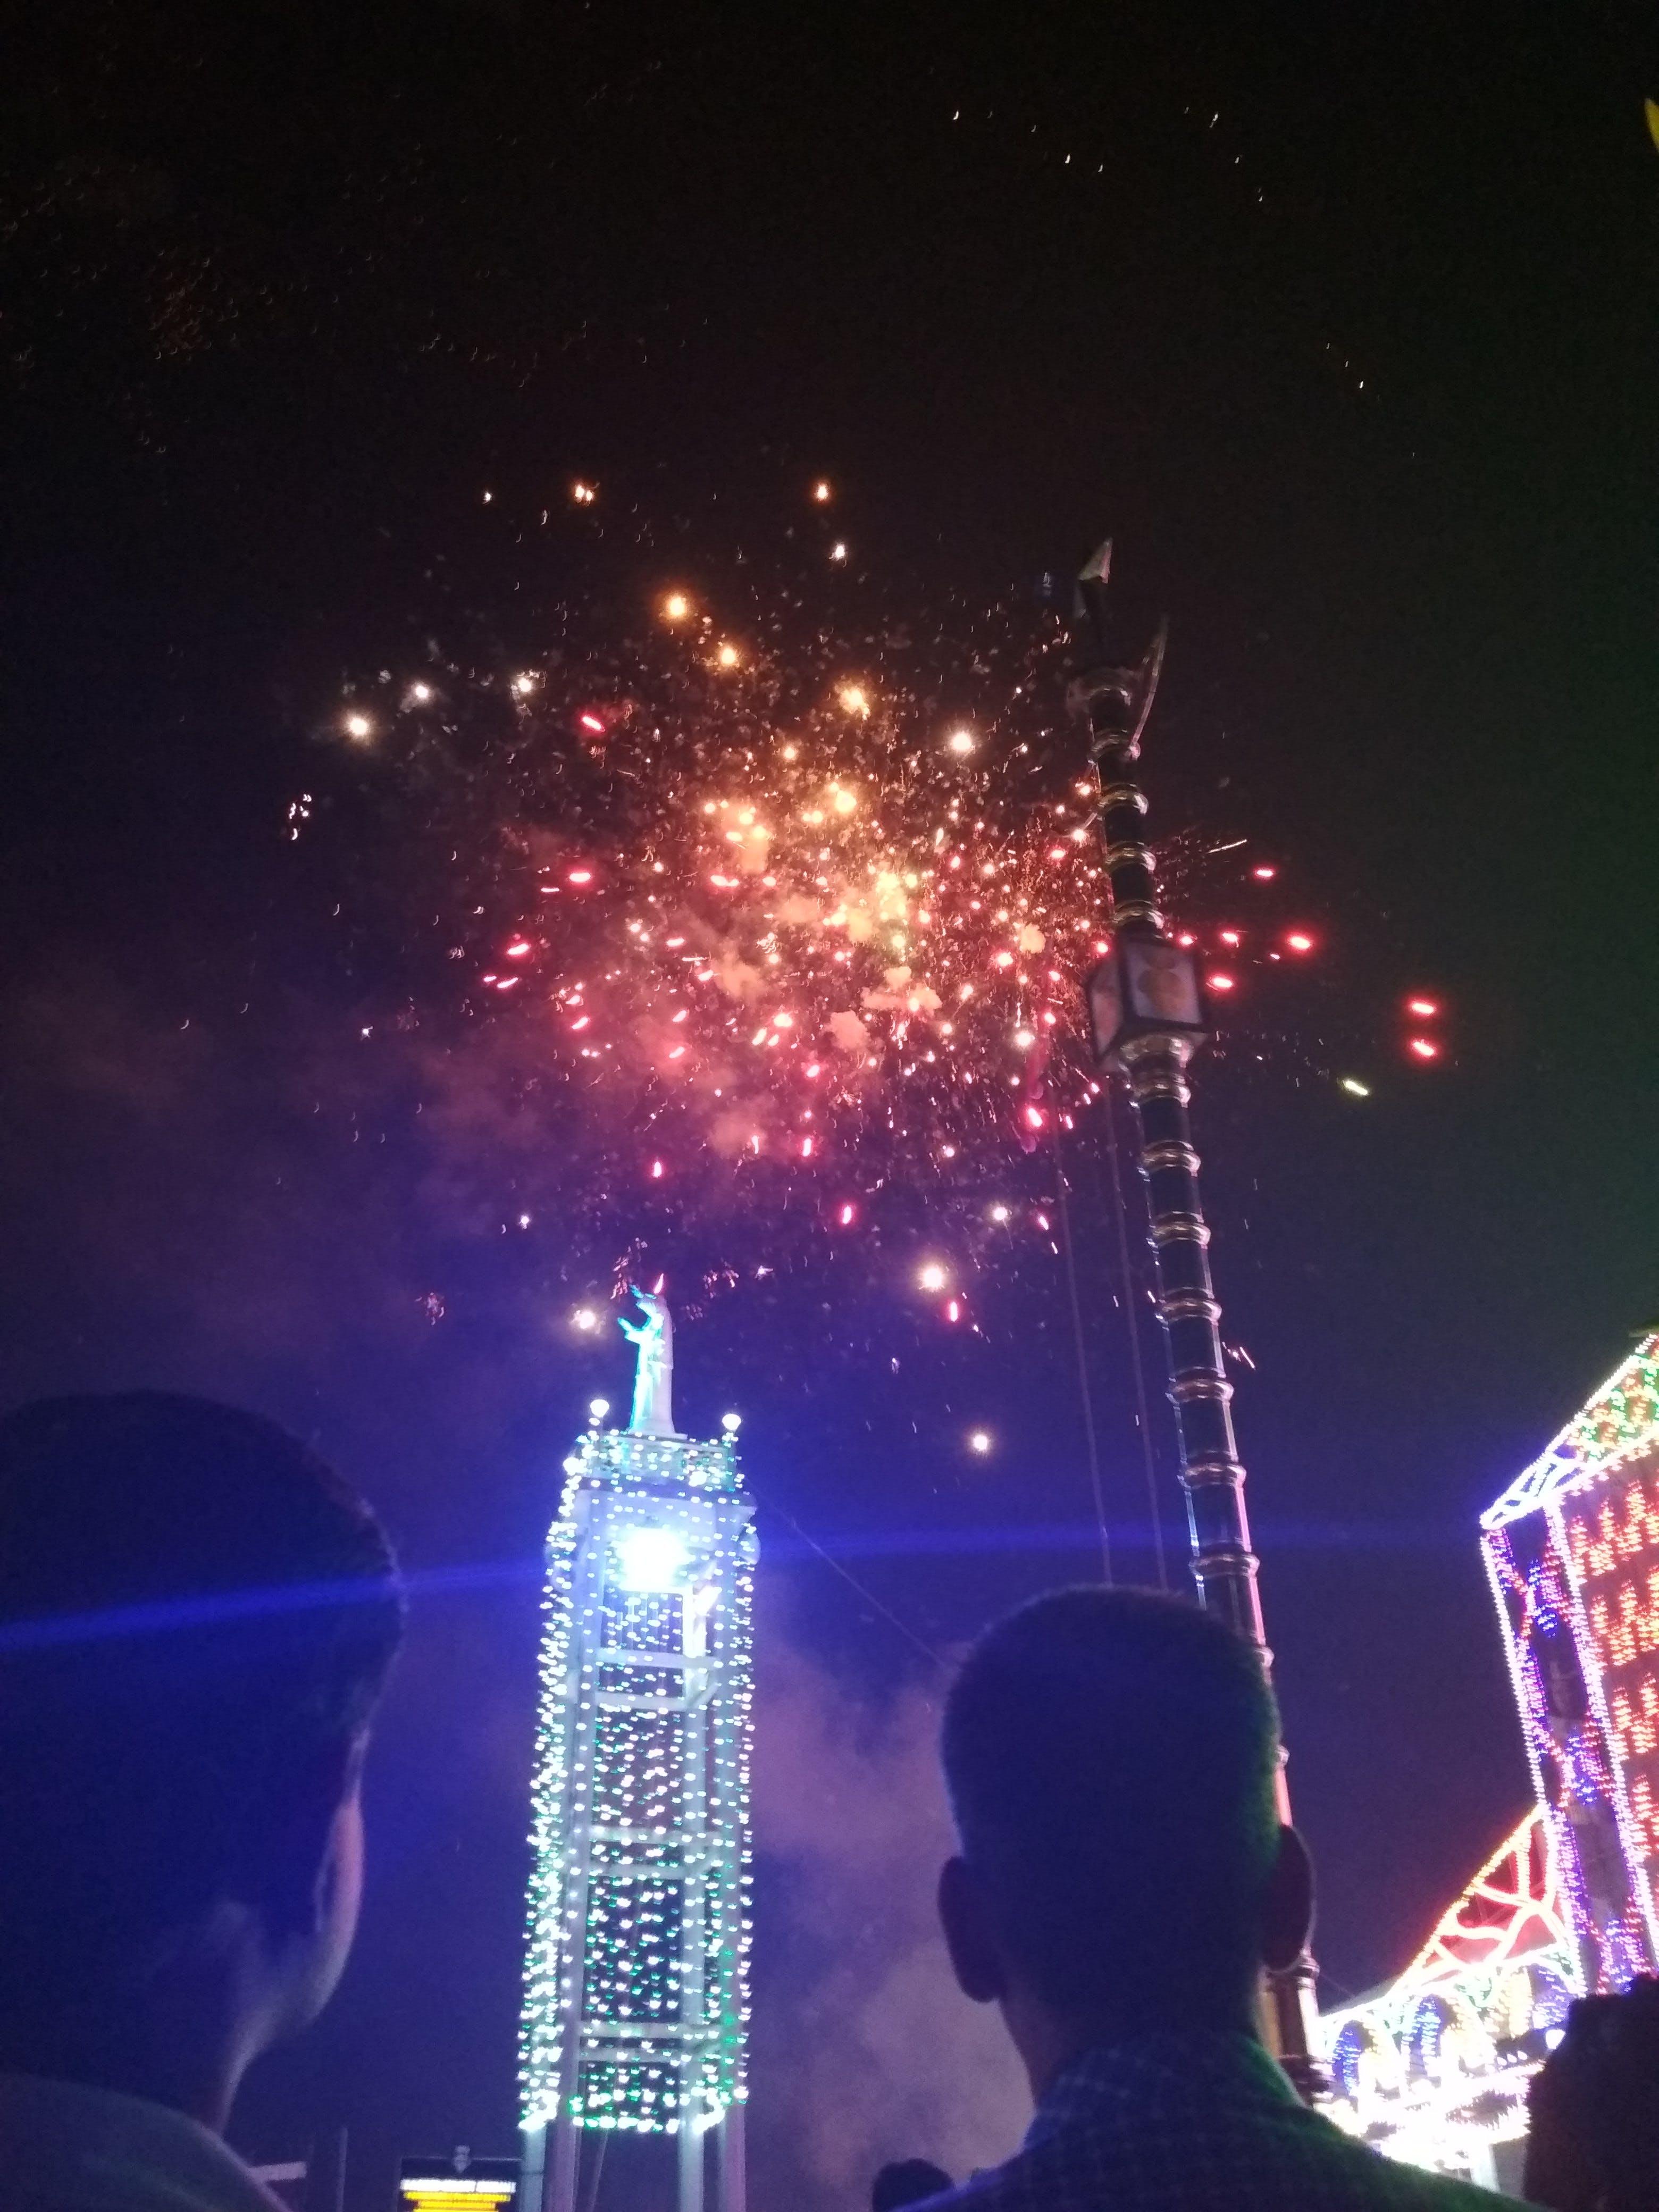 Free stock photo of fireworks, illumination